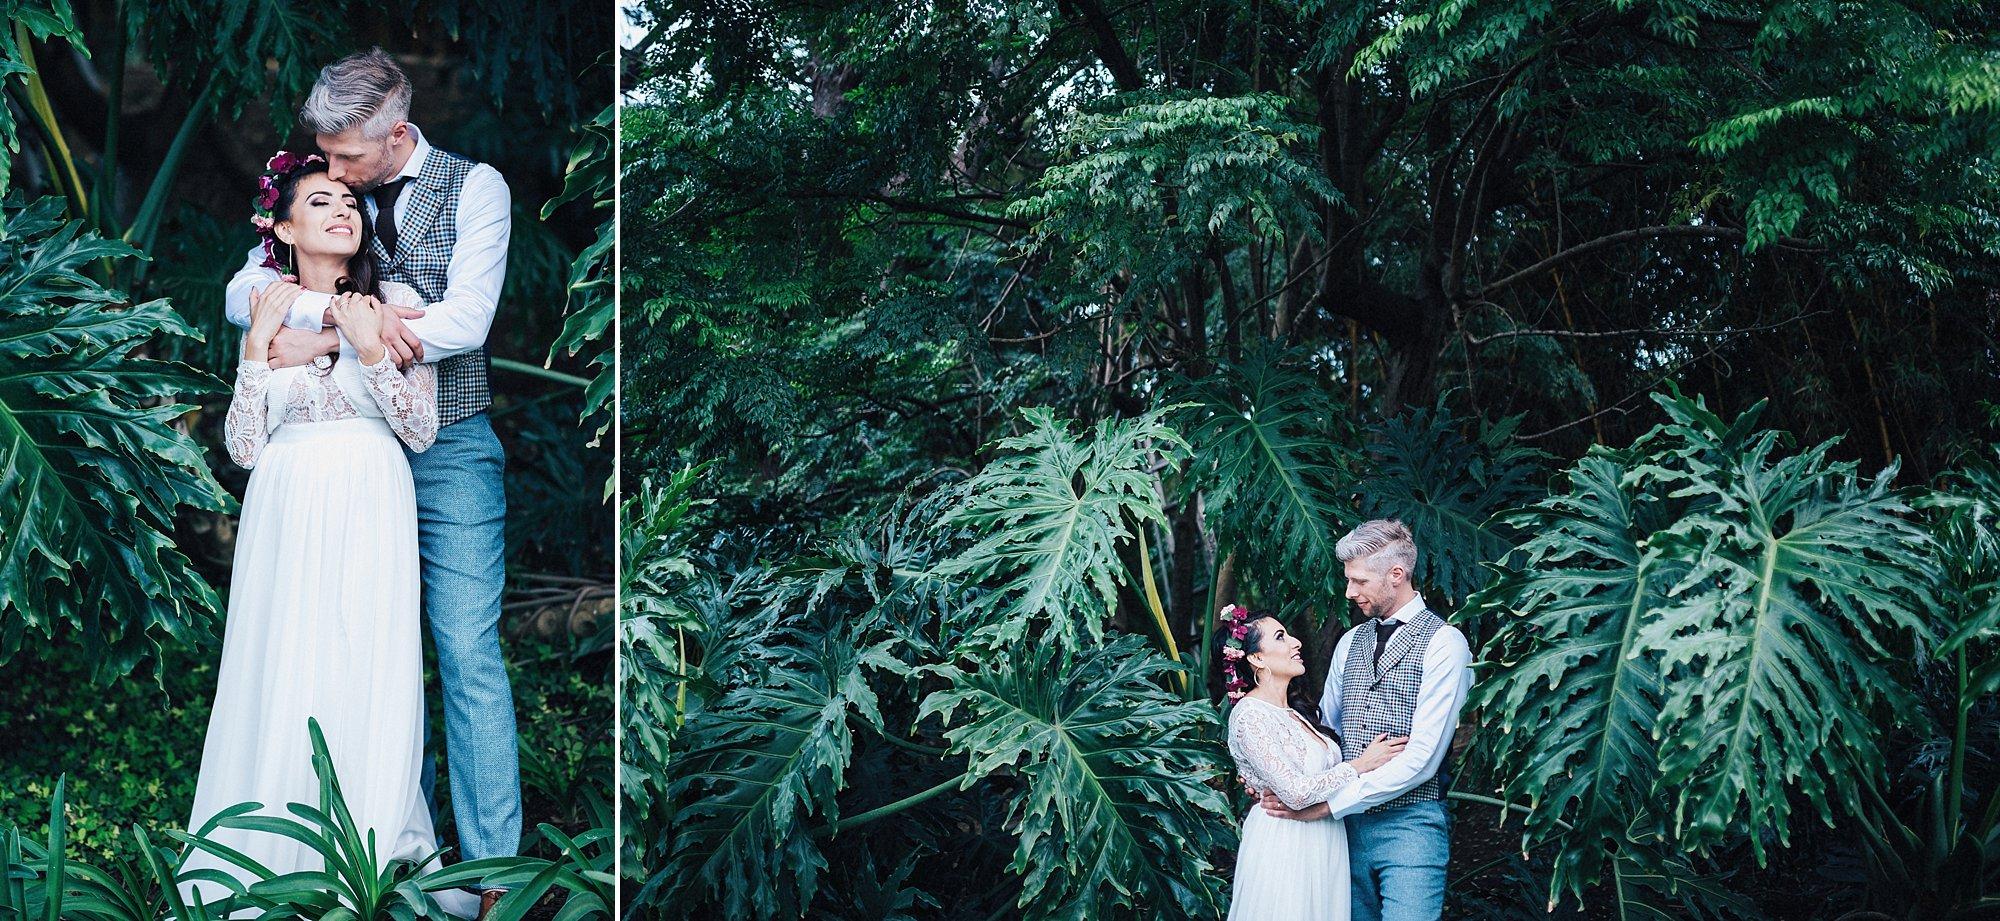 alex-yazmin-wedding-photographer-antigua-guatemala-117